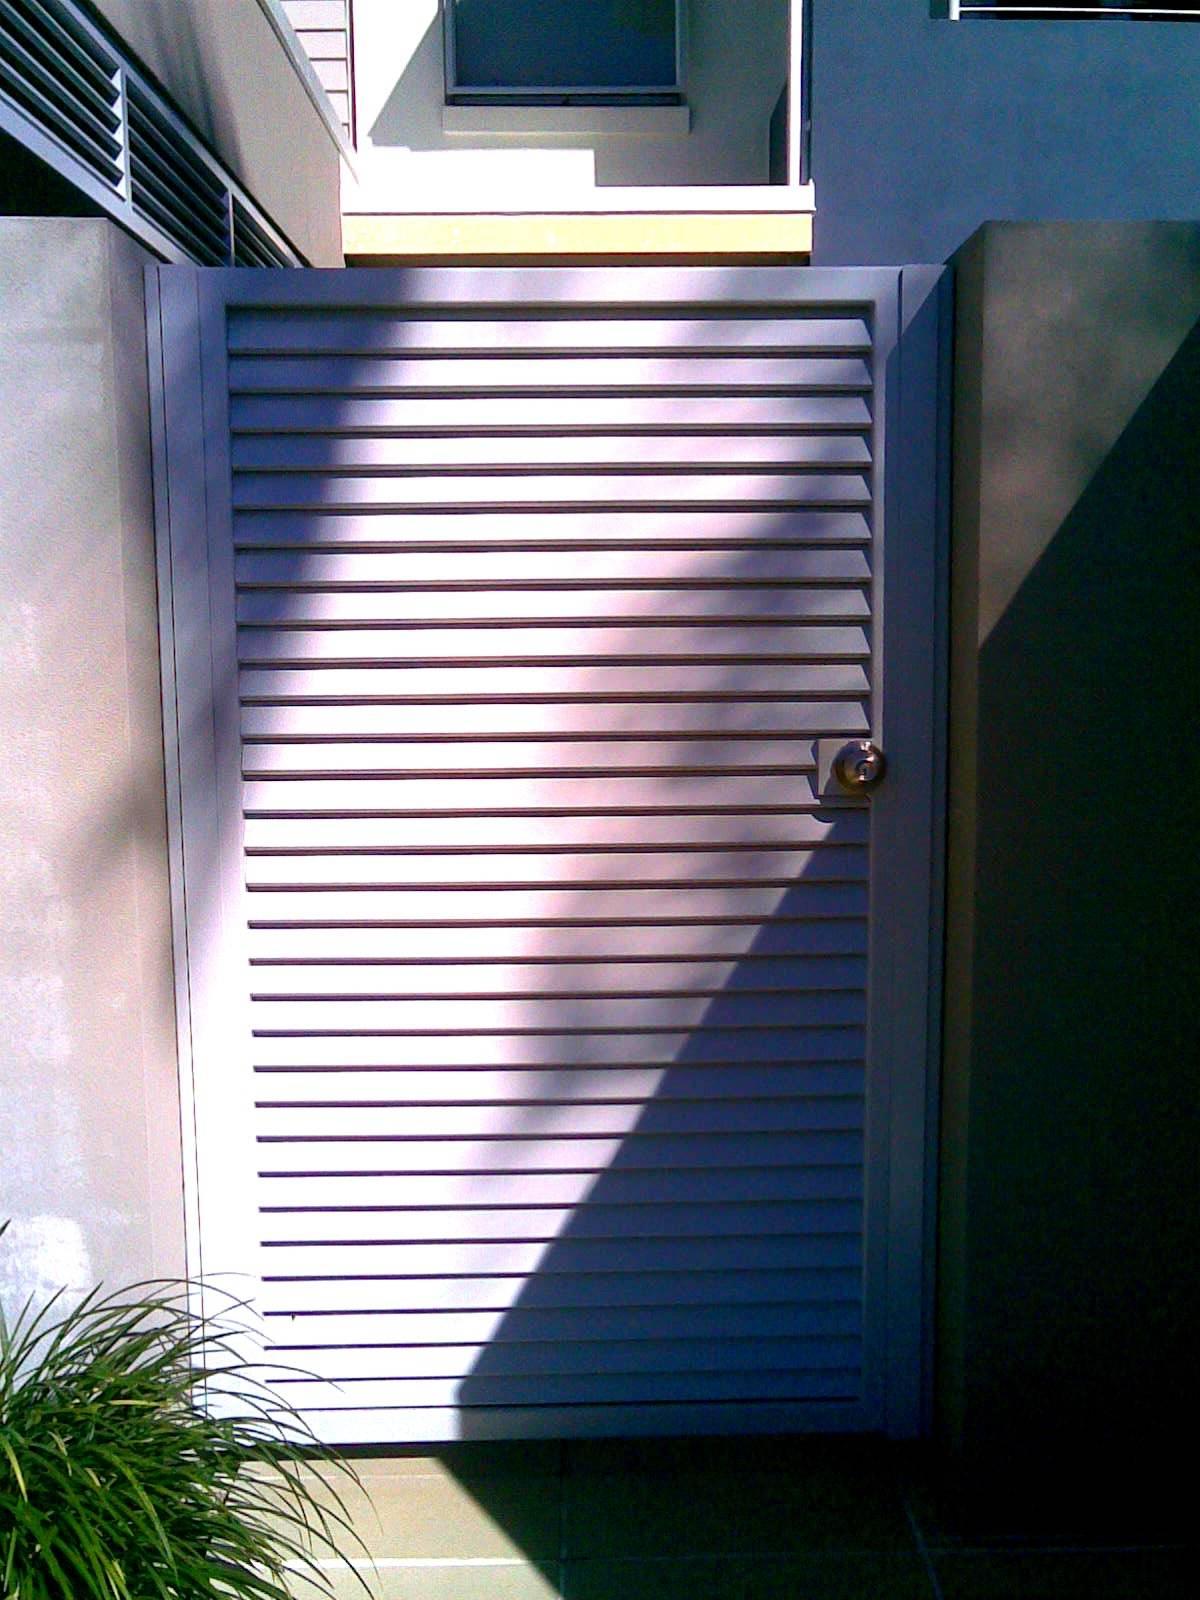 HORIZONTAL SLATTED PEDESTRIAN GATE